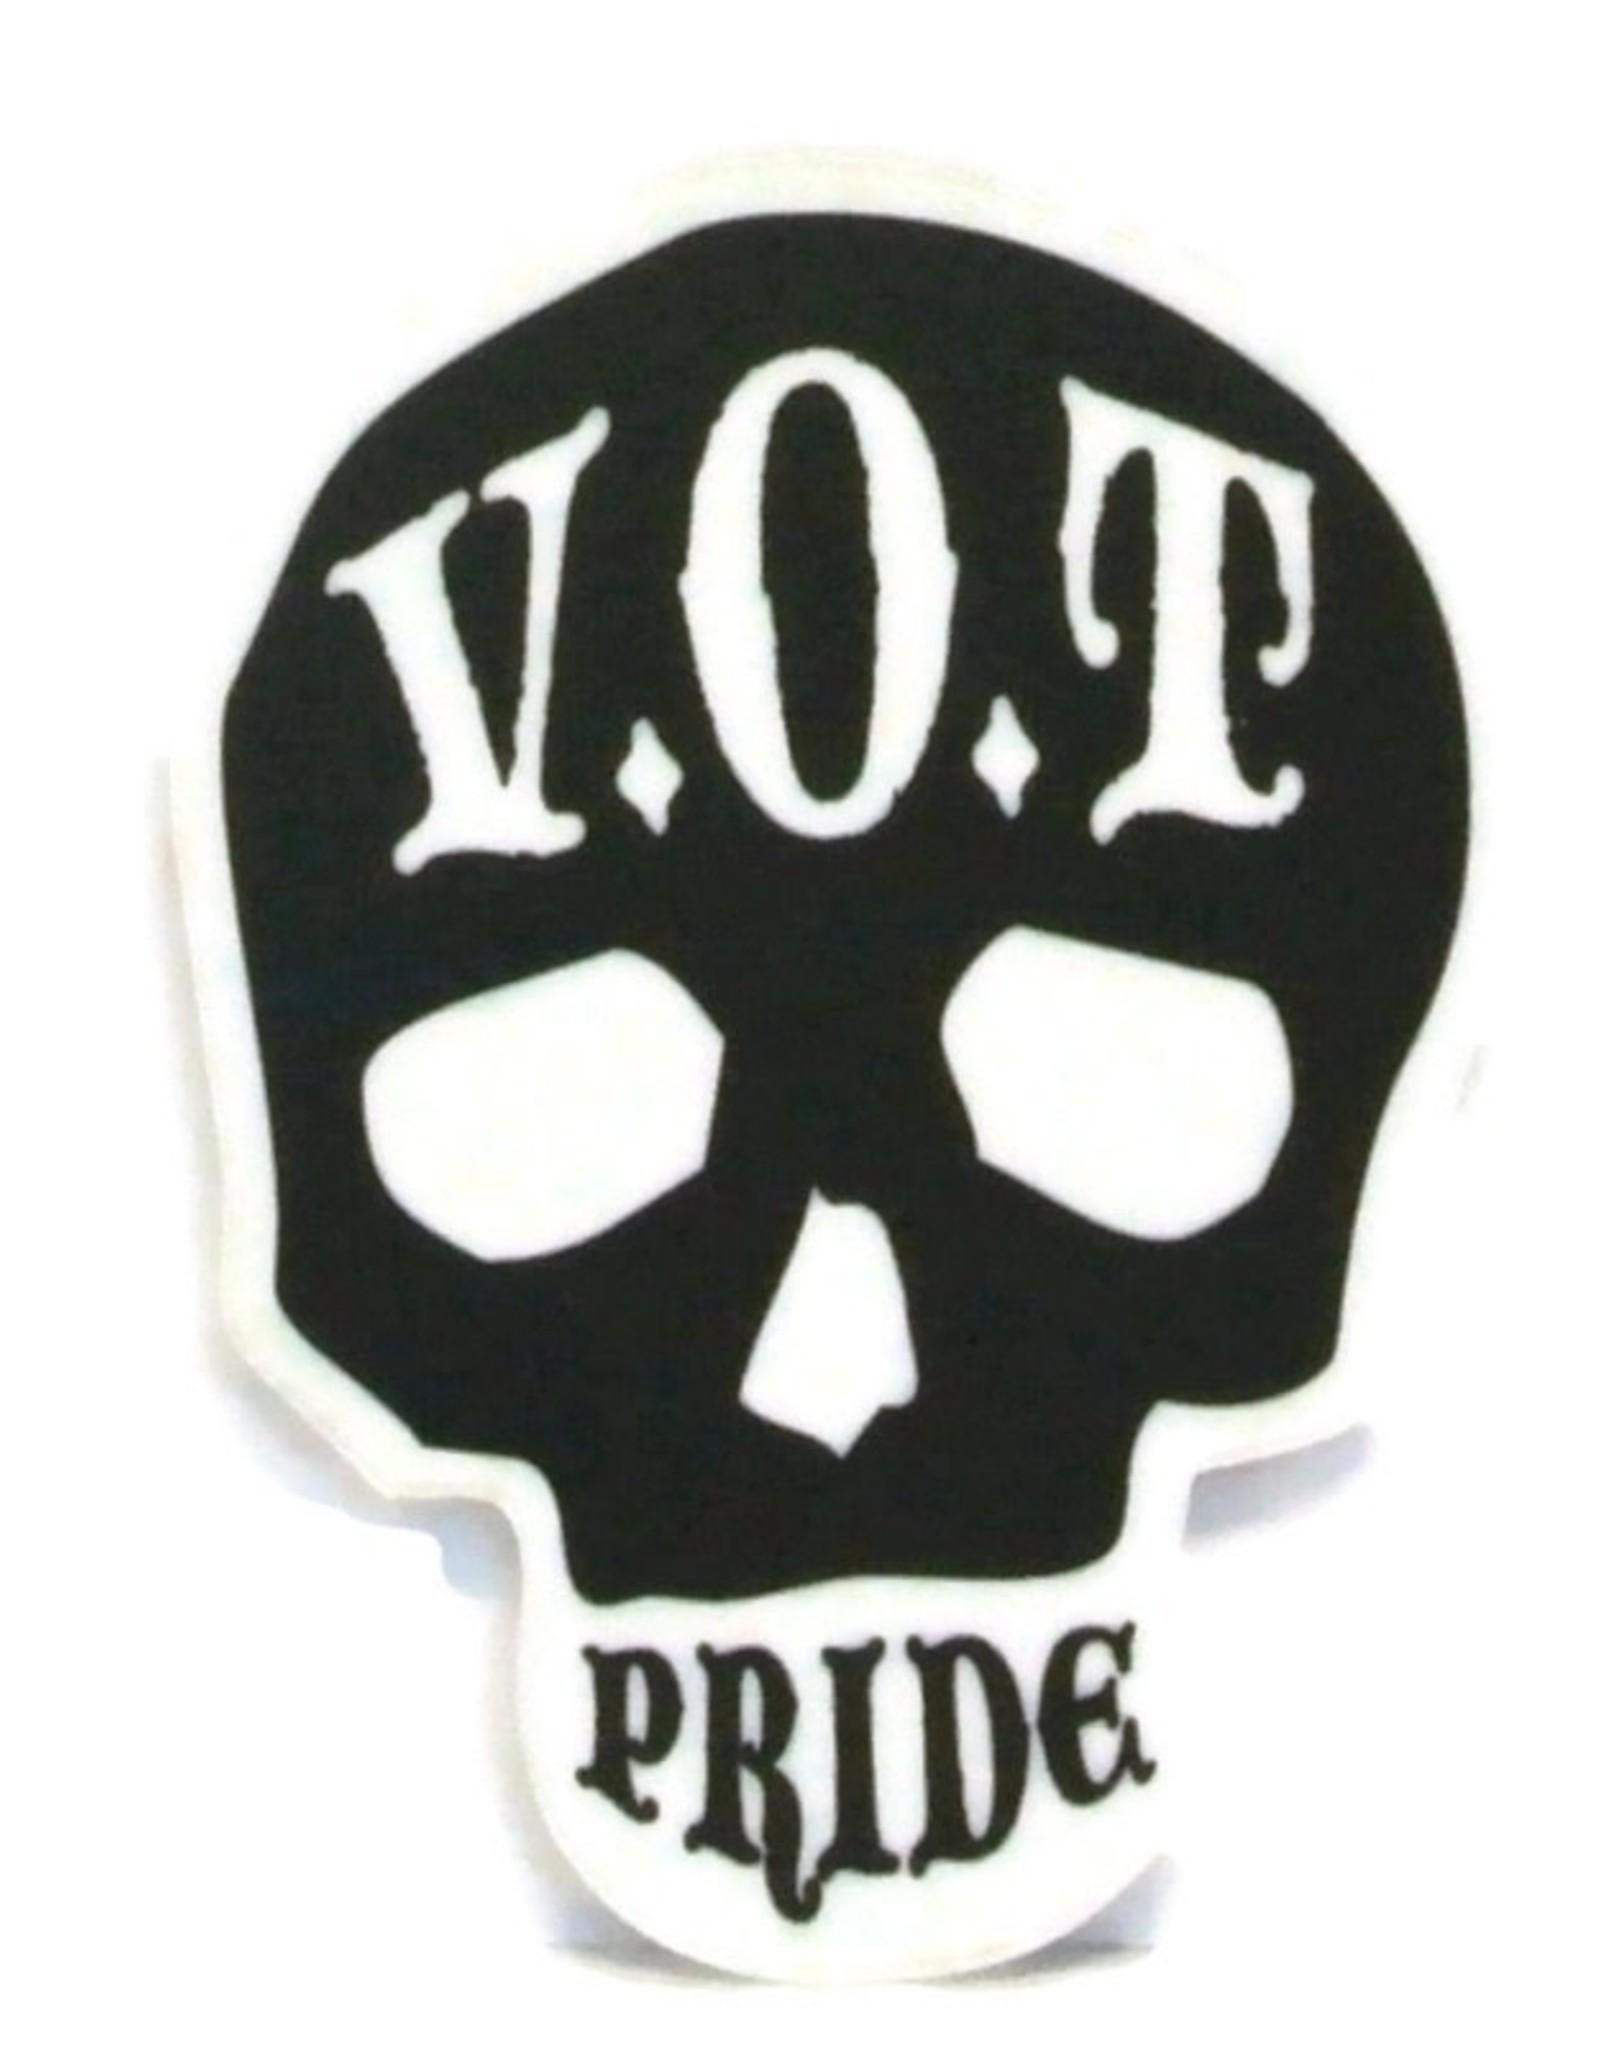 "V.O.T. PRIDE V.O.T Pride Sticker Black 2.5"" x 3.5"""